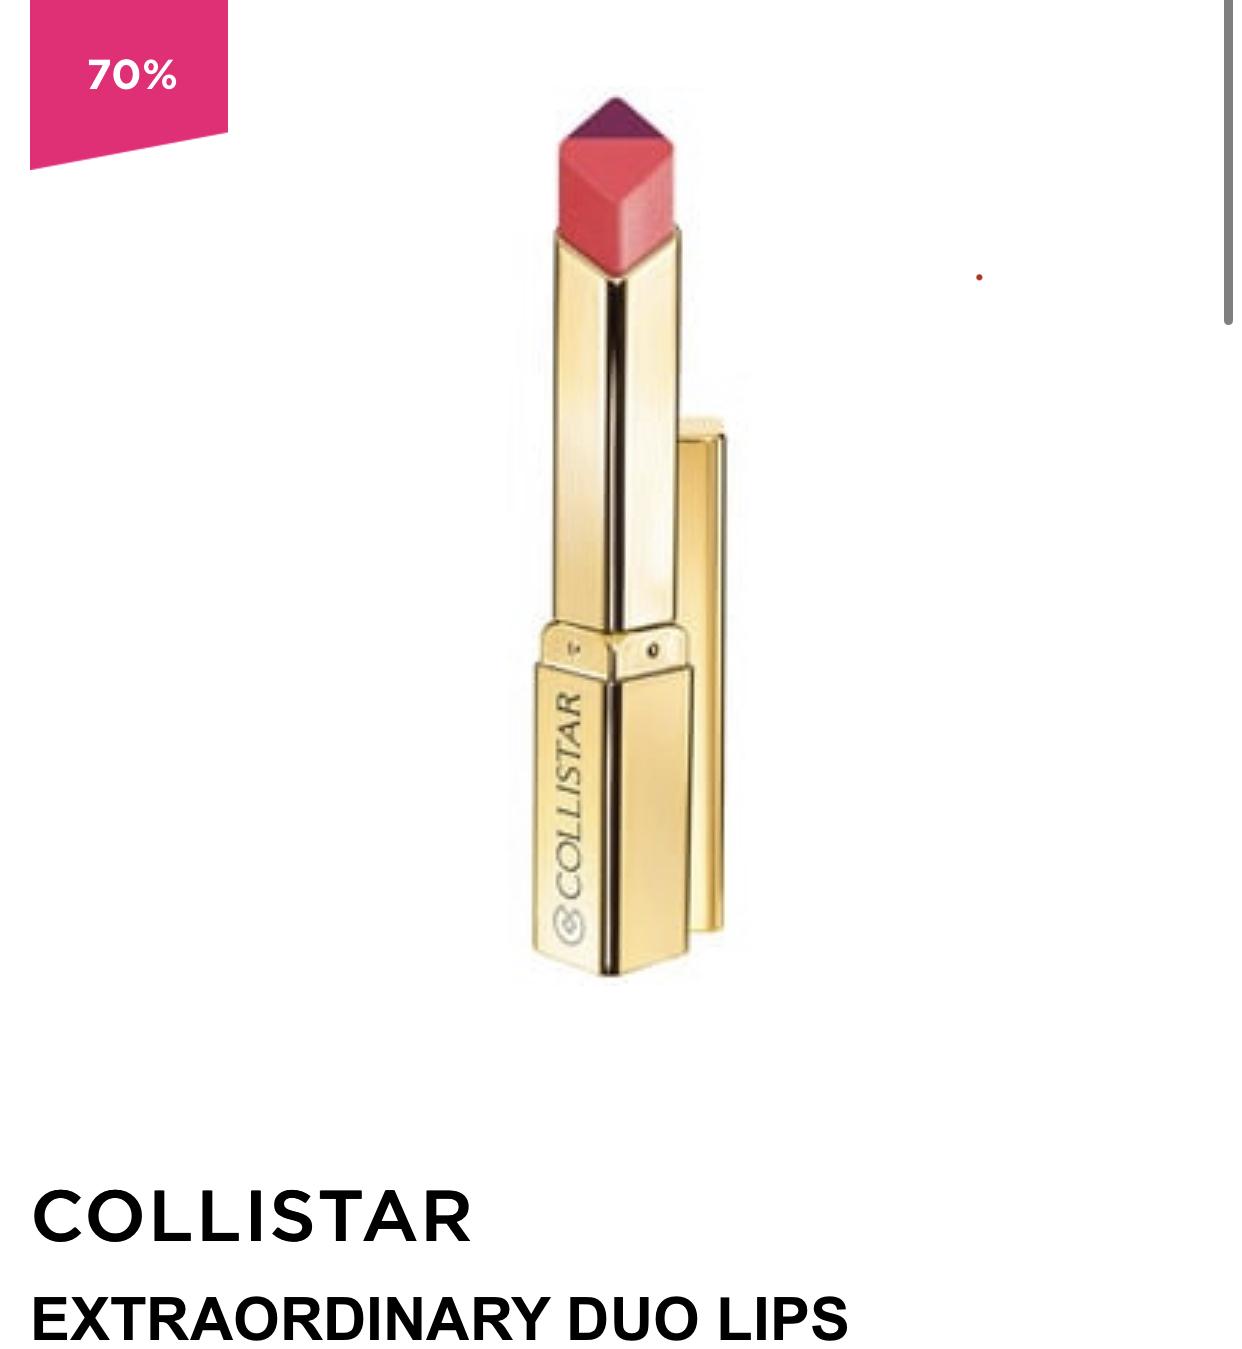 Collistar Extraordinary Duo Lips Lipstick @ ICI PARIS XL